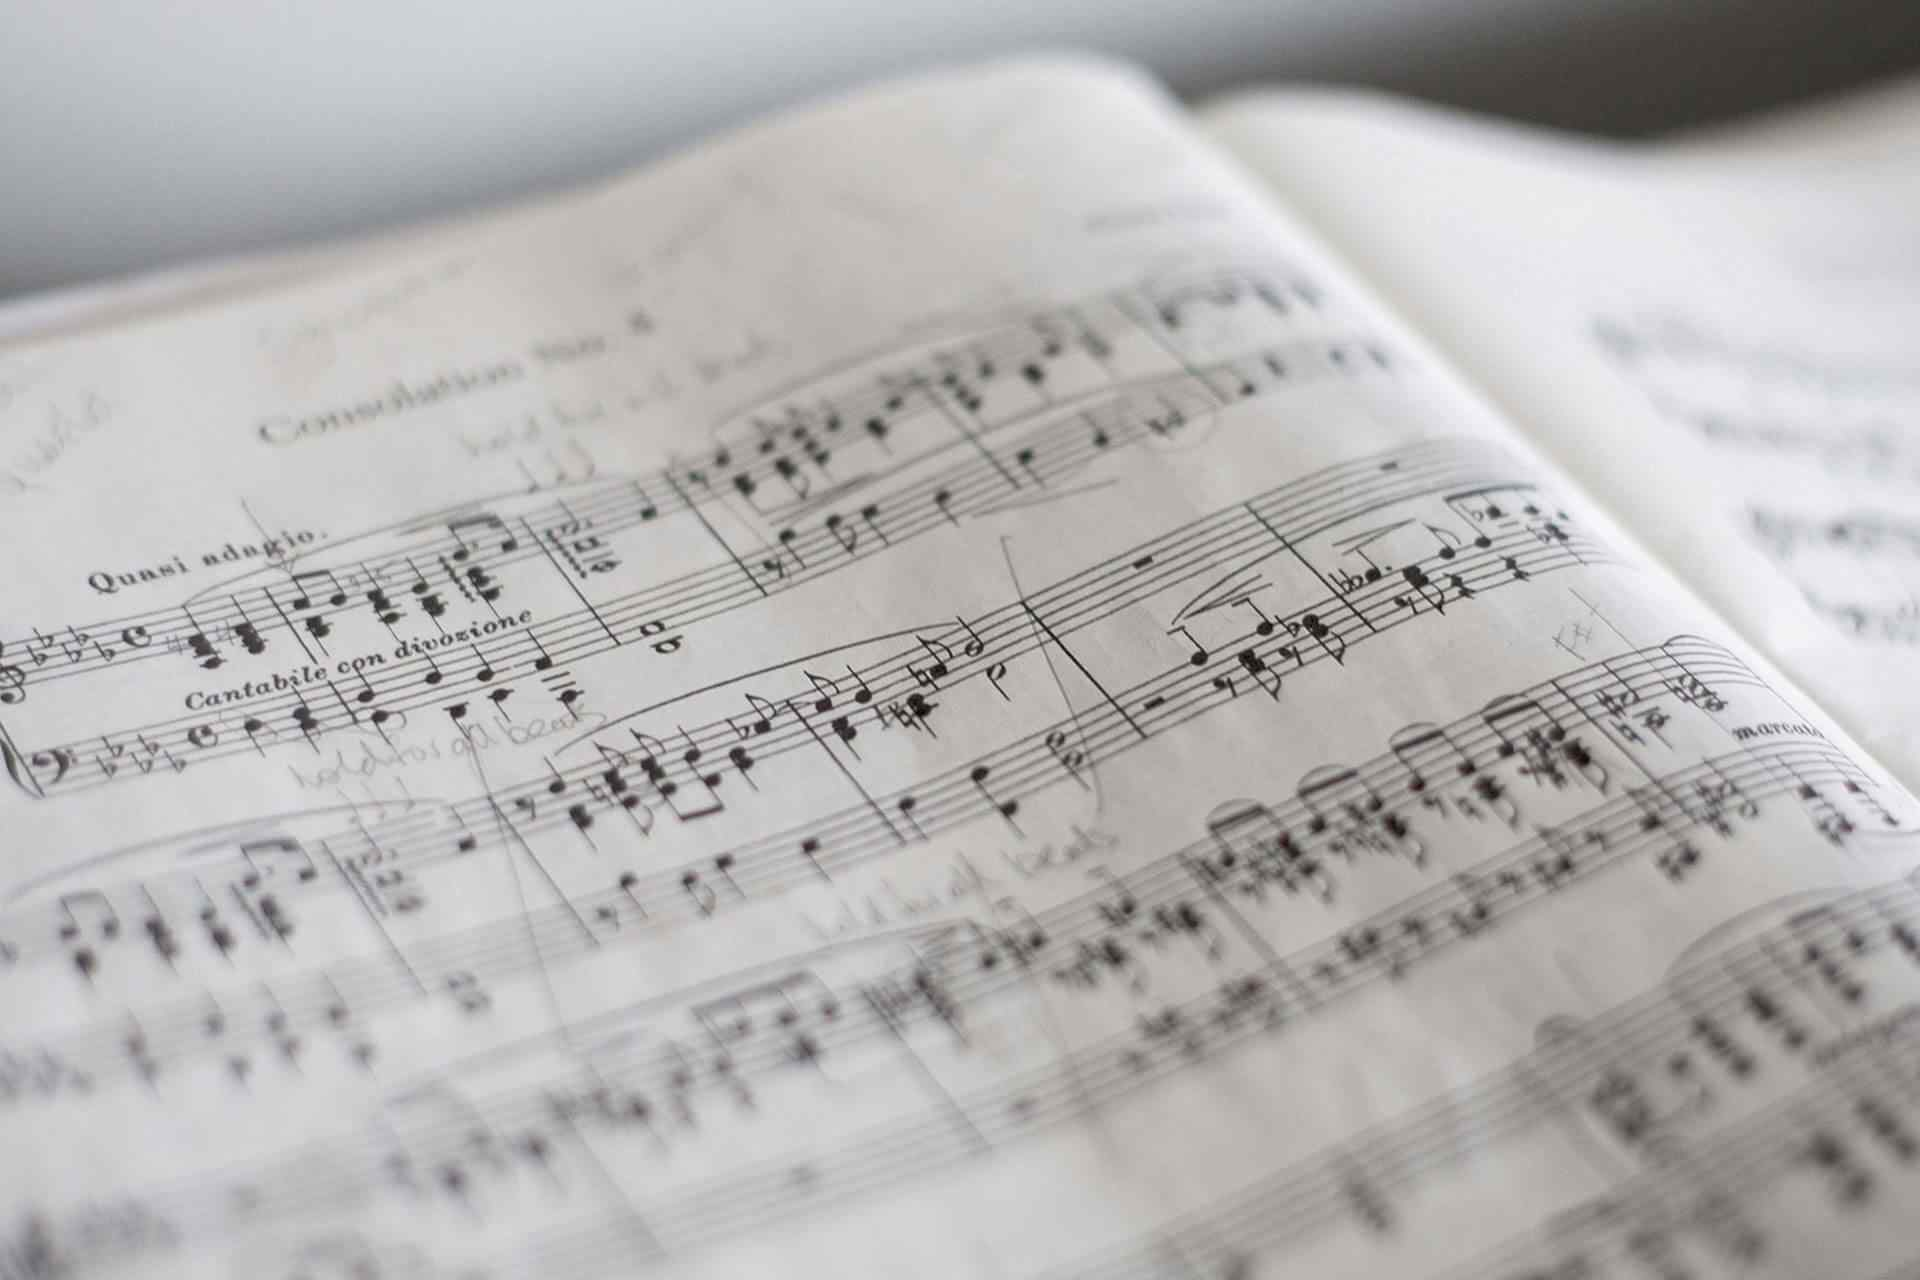 https://www.musikschule-heiligenhaus.de/wp-content/uploads/2018/09/portfolio_01.jpg